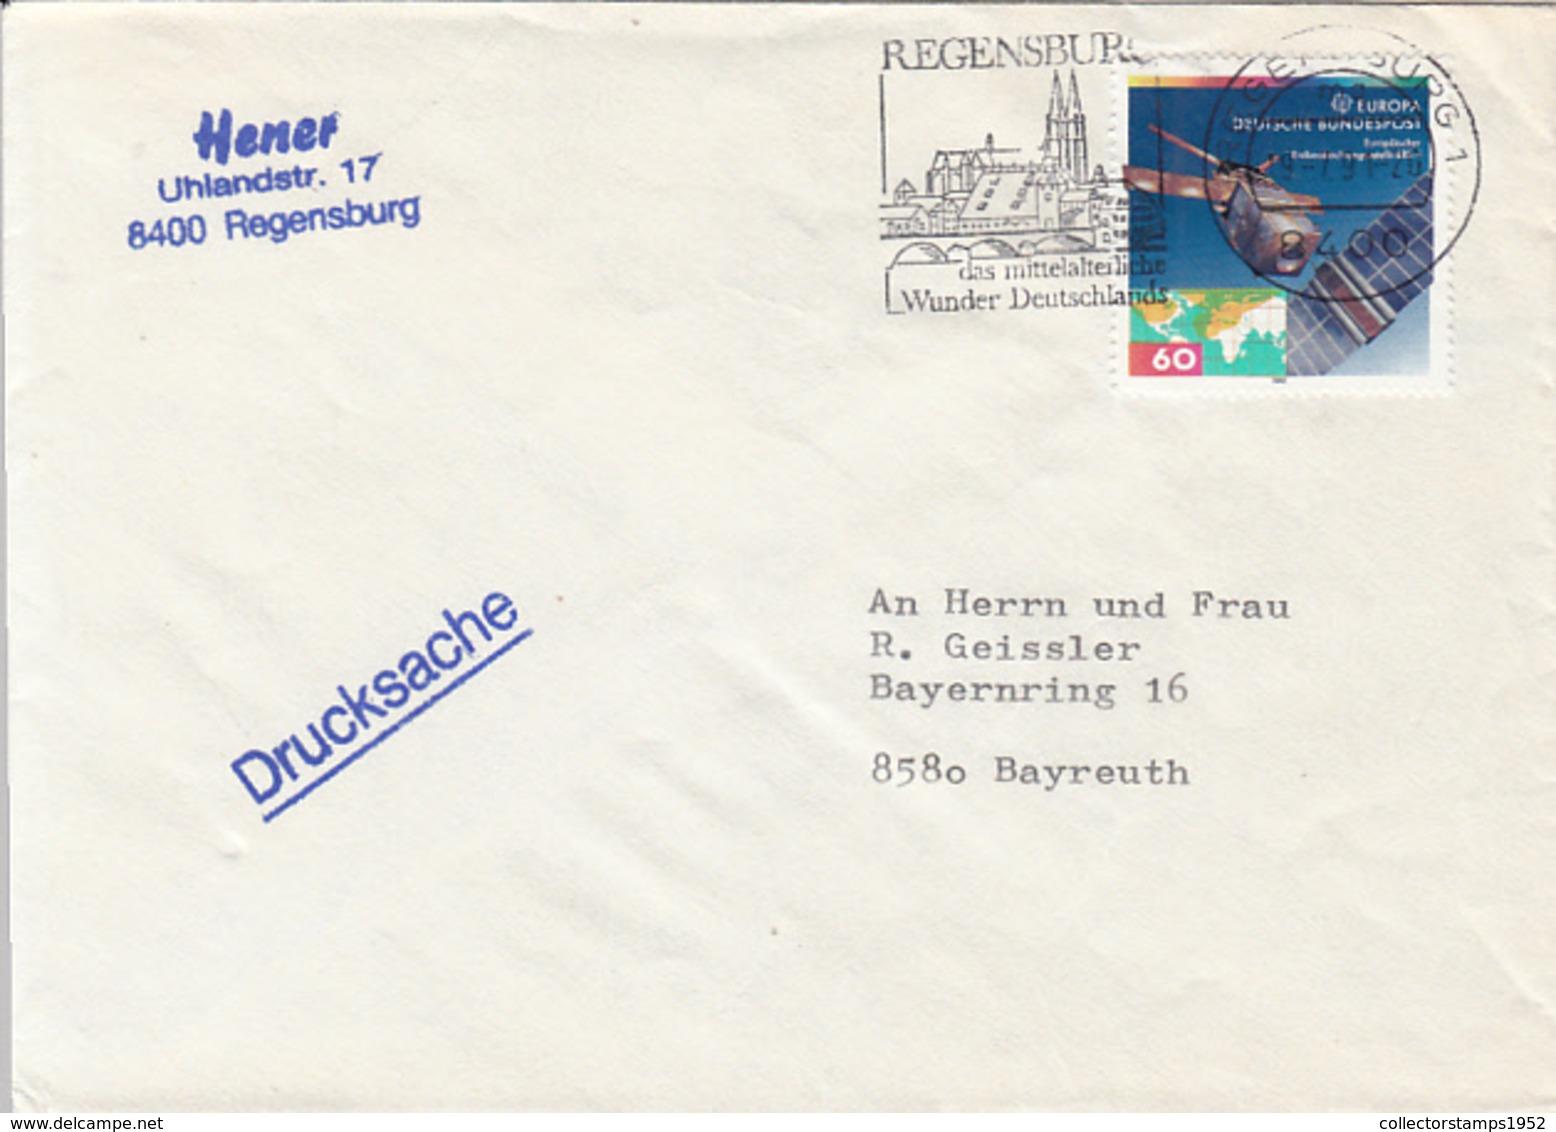 84100- EUROPA CEPT, SATELLITE STAMPS ON COVER, REGENSBURG SPECIAL POSTMARK, 1991, GERMANY - Storia Postale